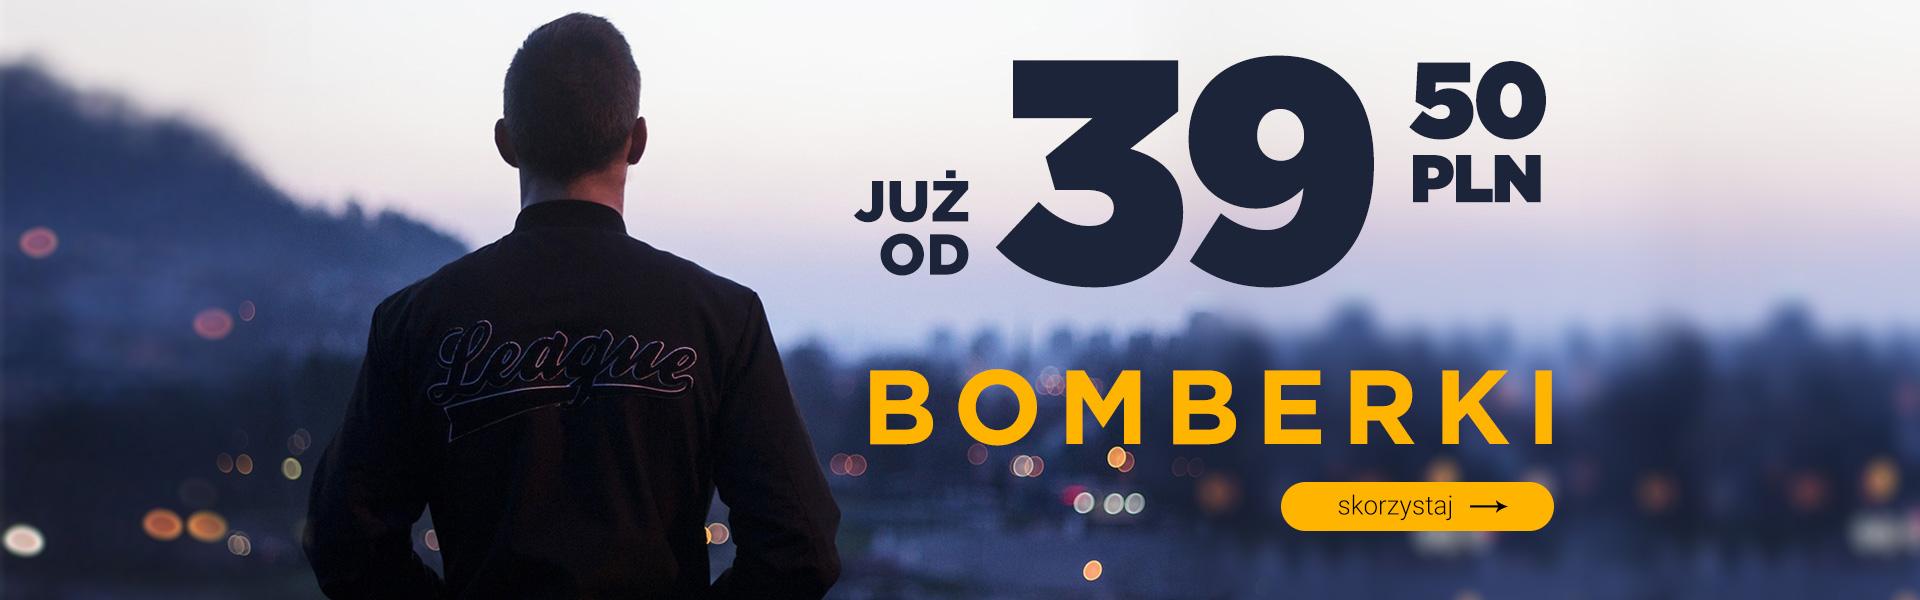 Edoti: bomberki już od 39,50 zł                         title=